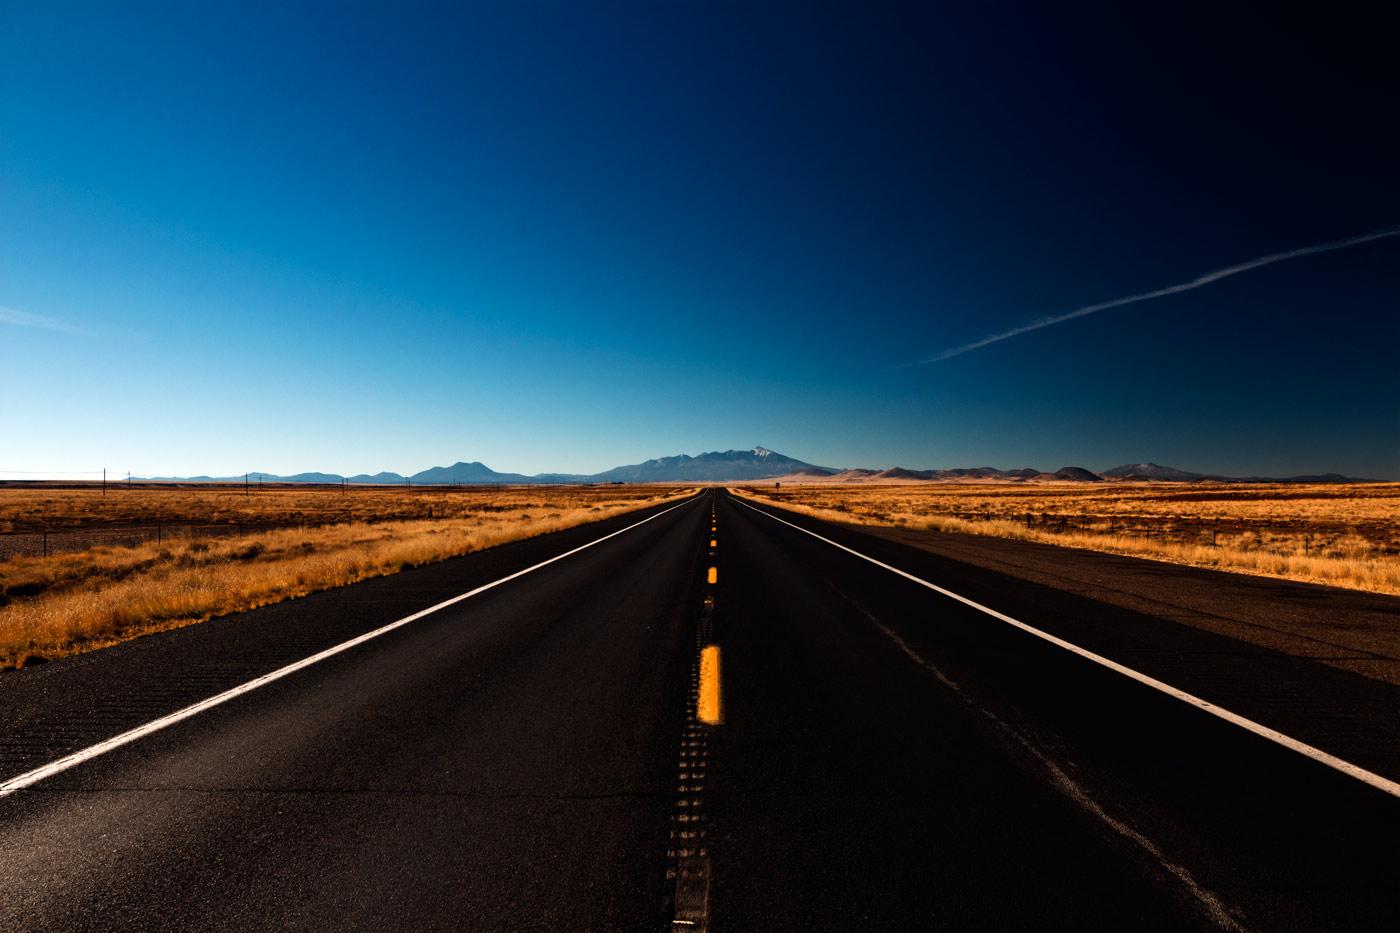 10 Great Road Trip Photography Tips » ItsJustLight.com